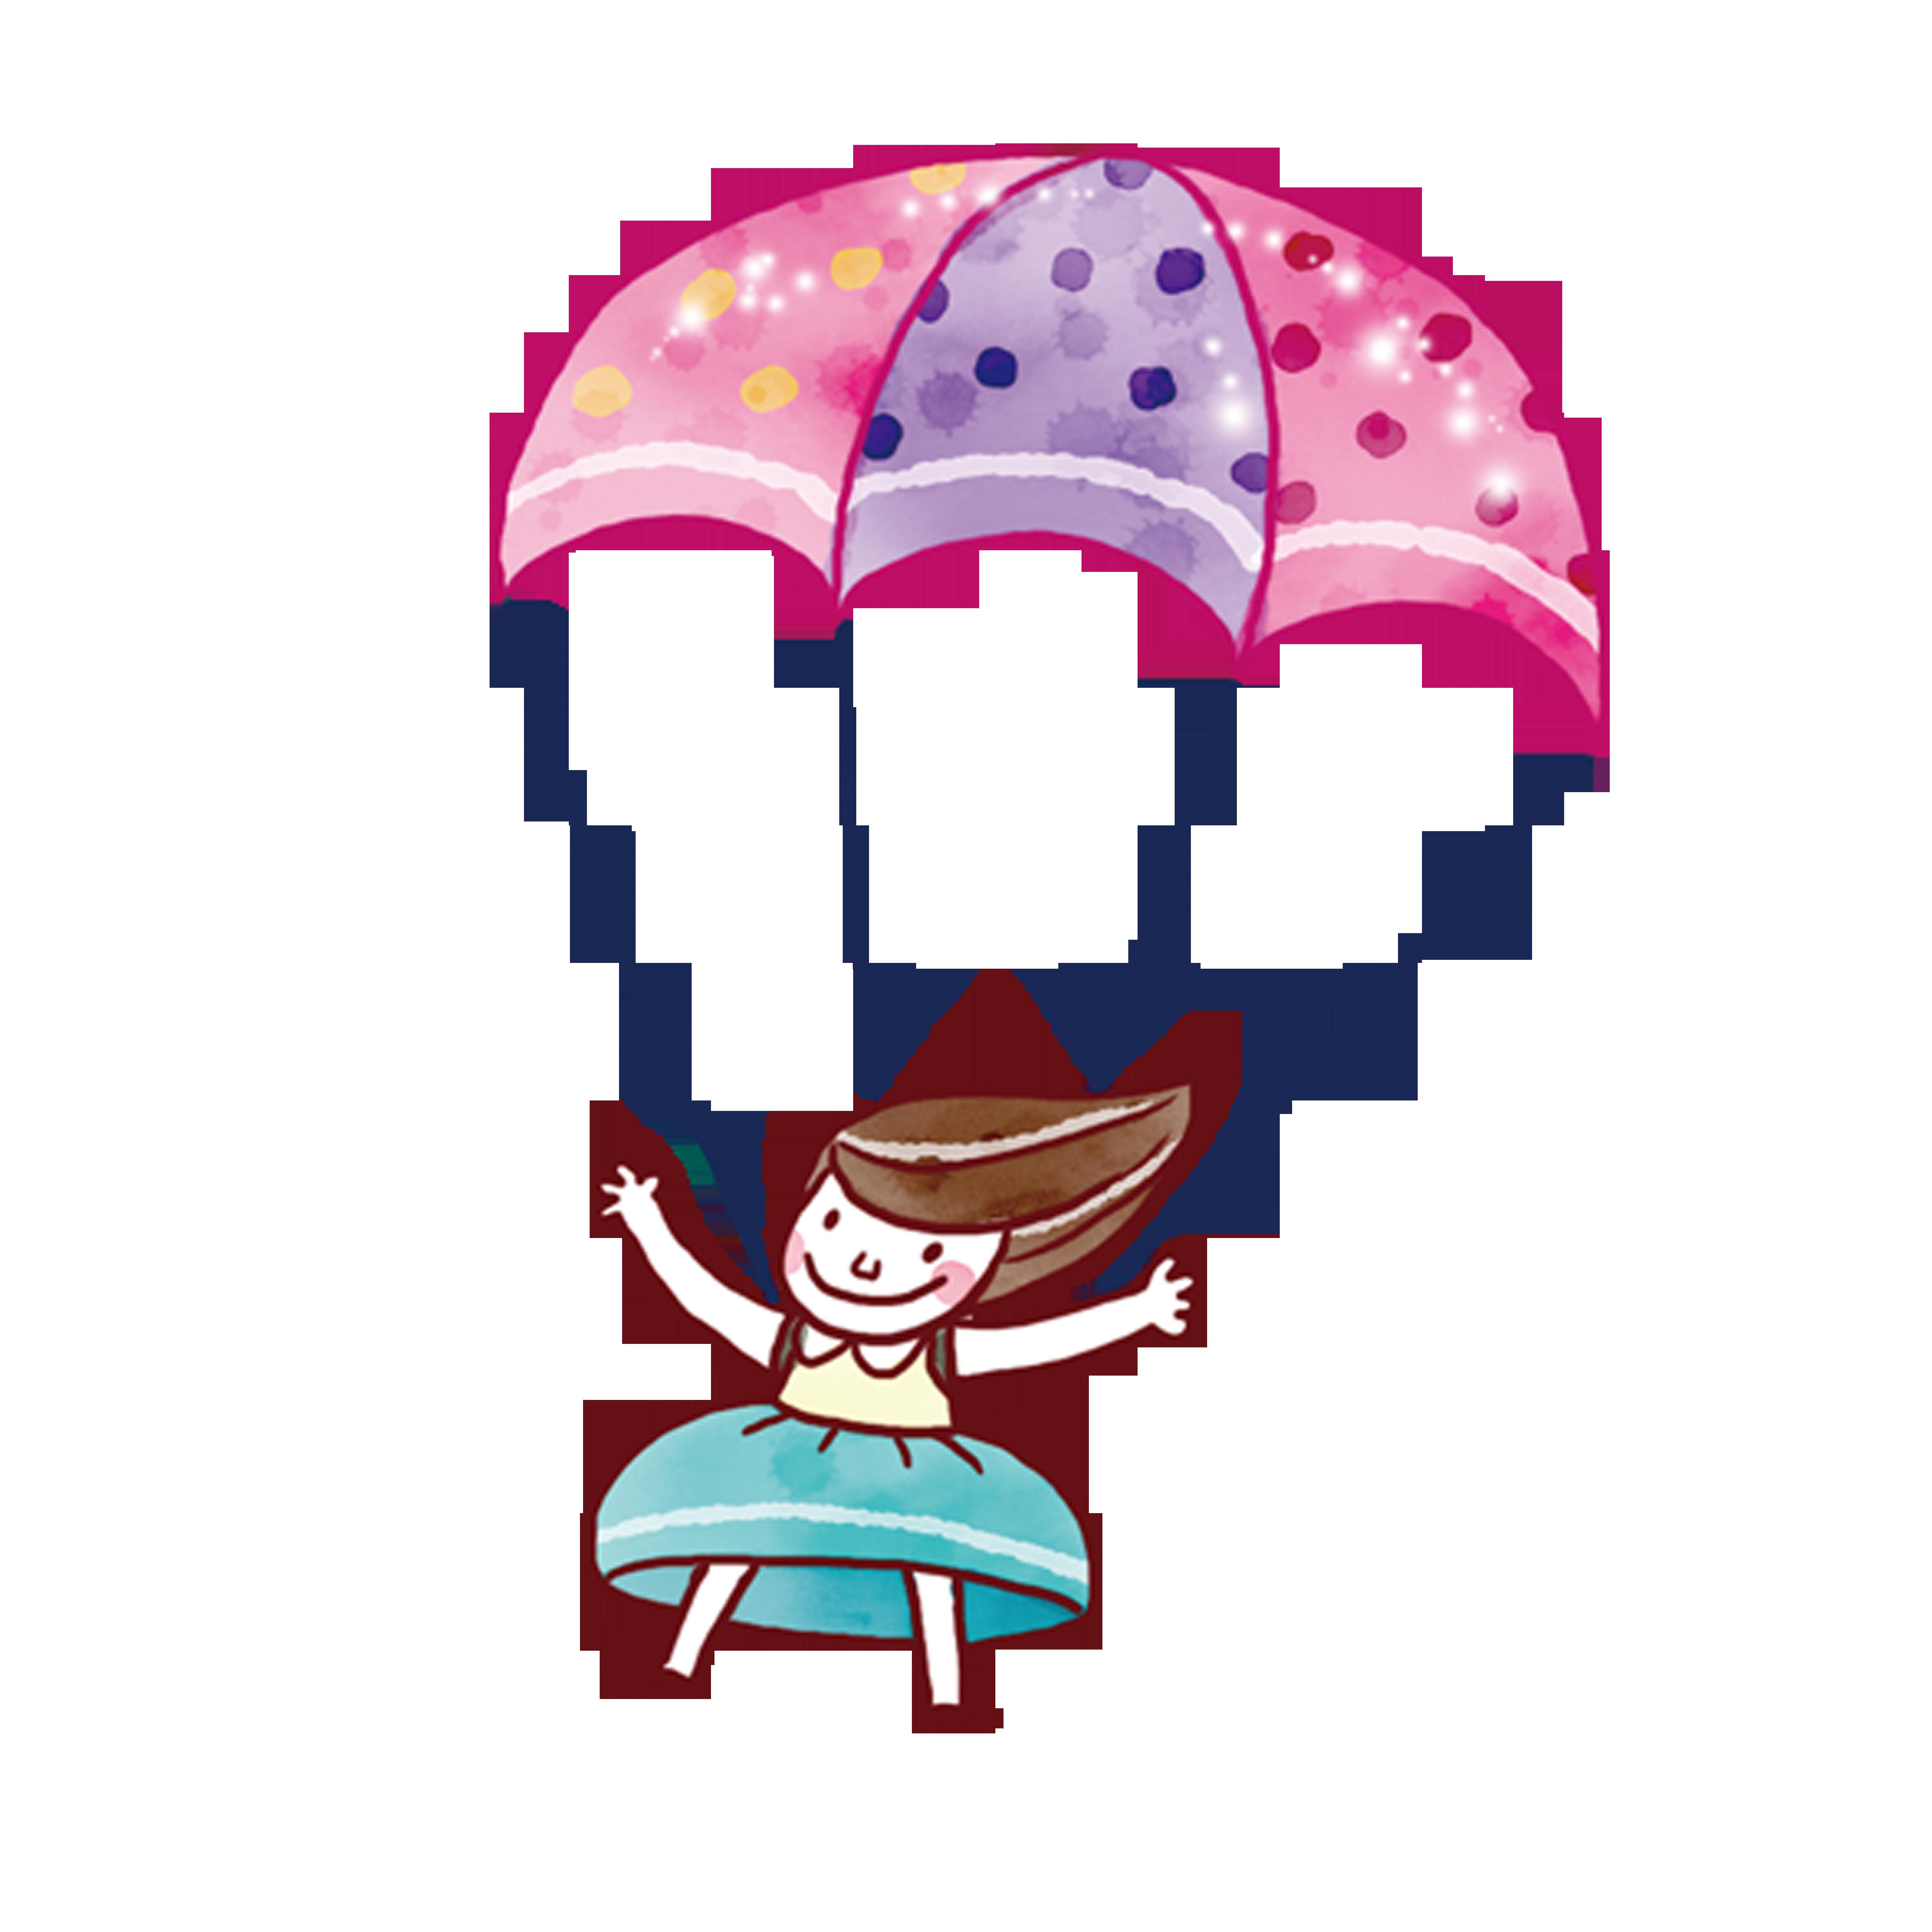 Parachuting illustration color people. Parachute clipart pink